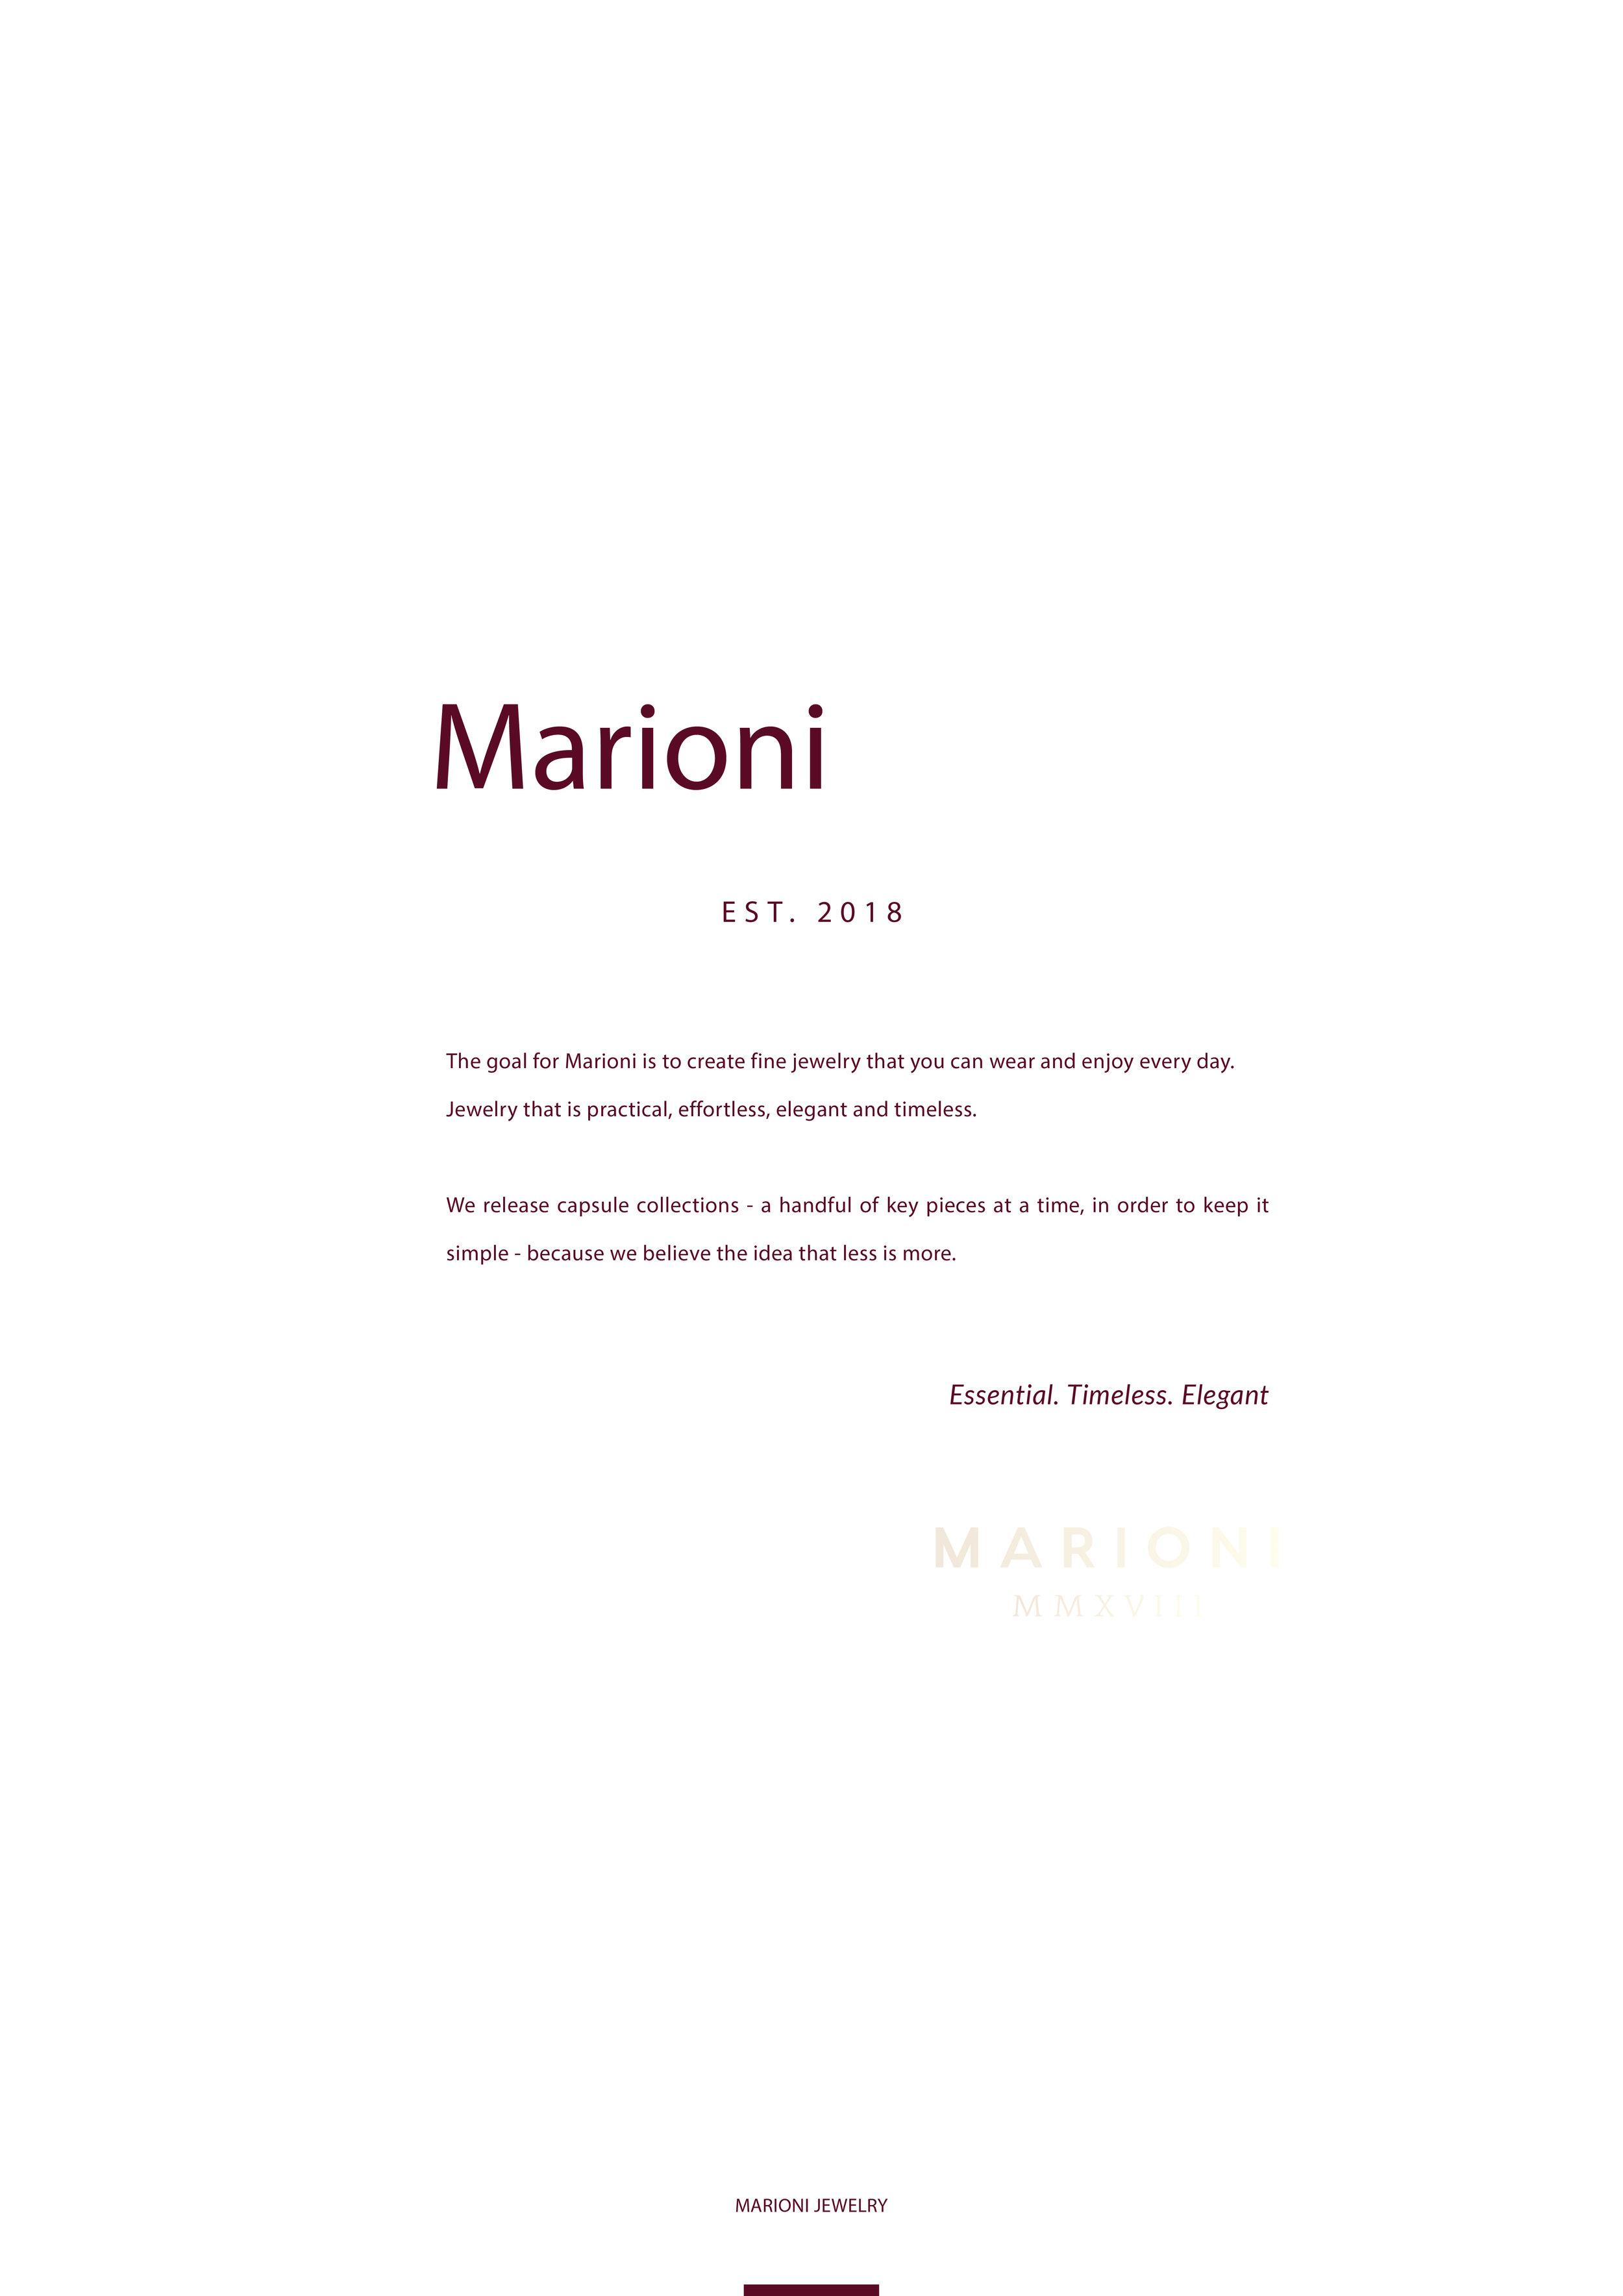 Marioni_Jewelry_Lookbook4.jpg